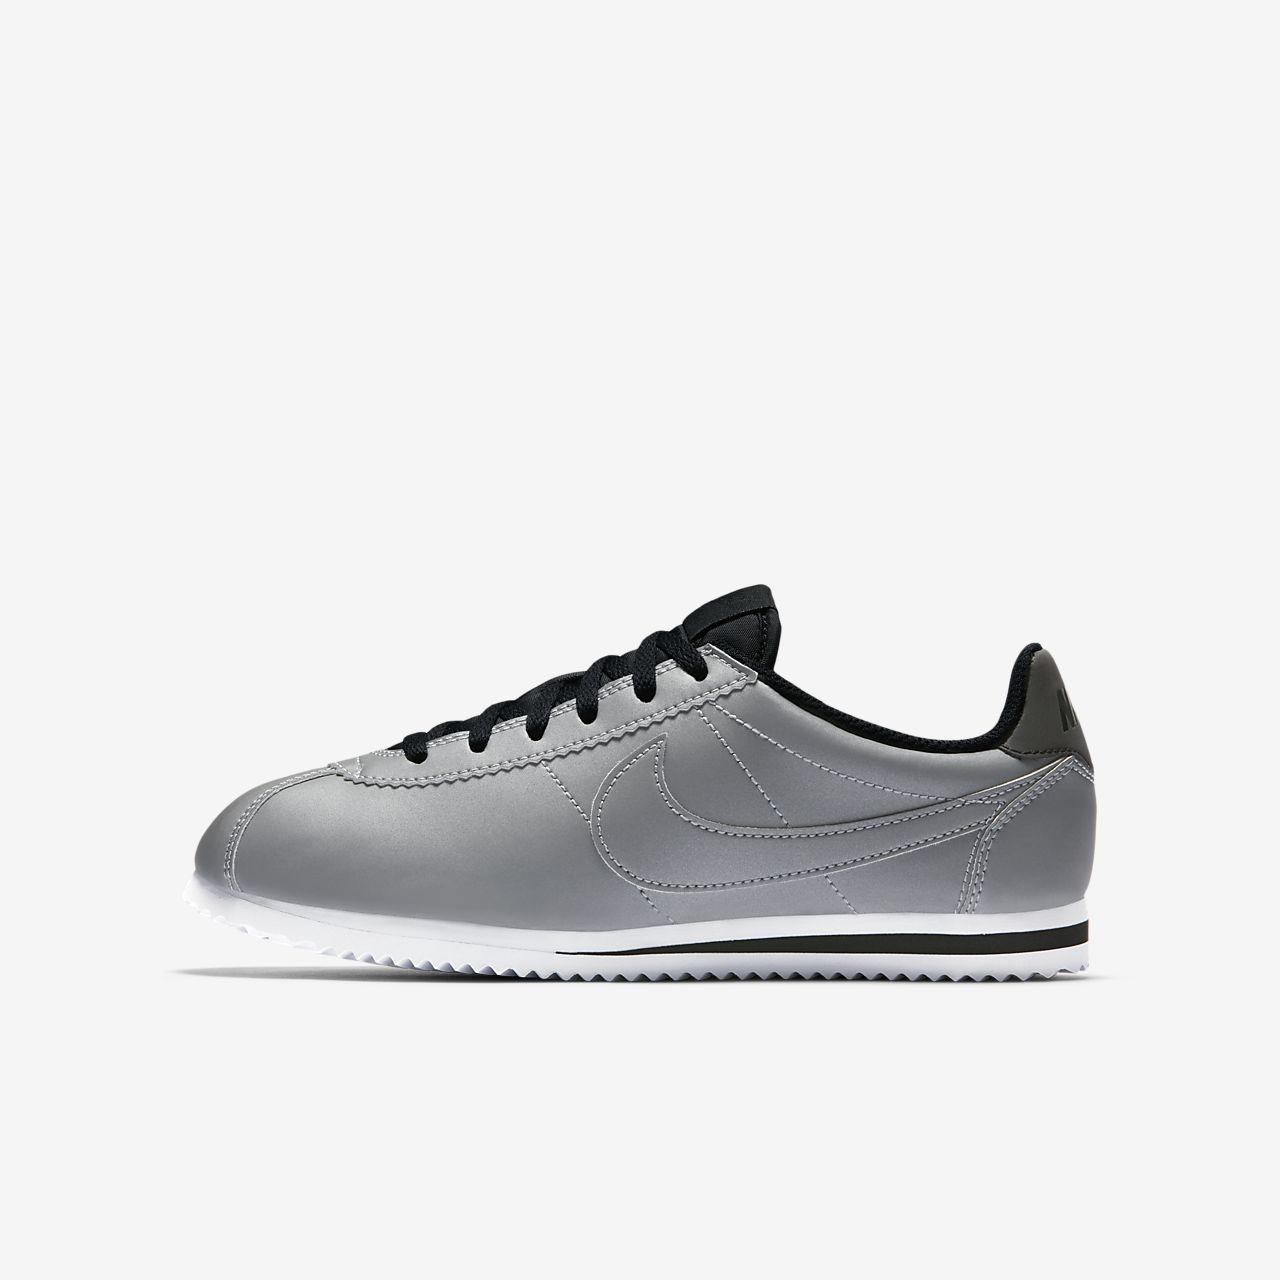 uk availability e584c d80c2 hot nike cortez siyah beyaz bac99 01e97  official nike cortez premium older  kids shoe 2816b f1689